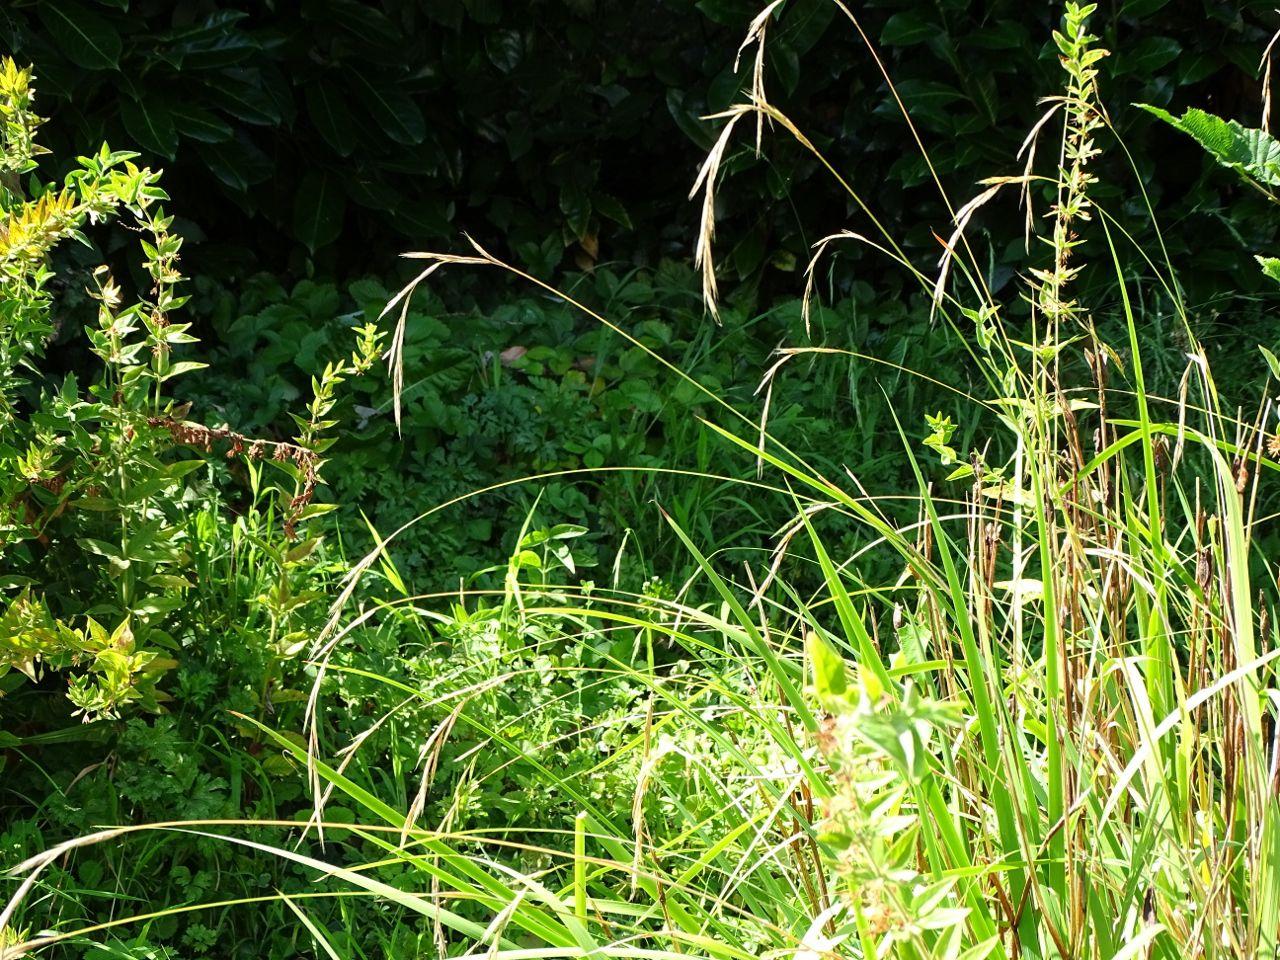 Brachypodium sylvaticum, Brachypode des bois